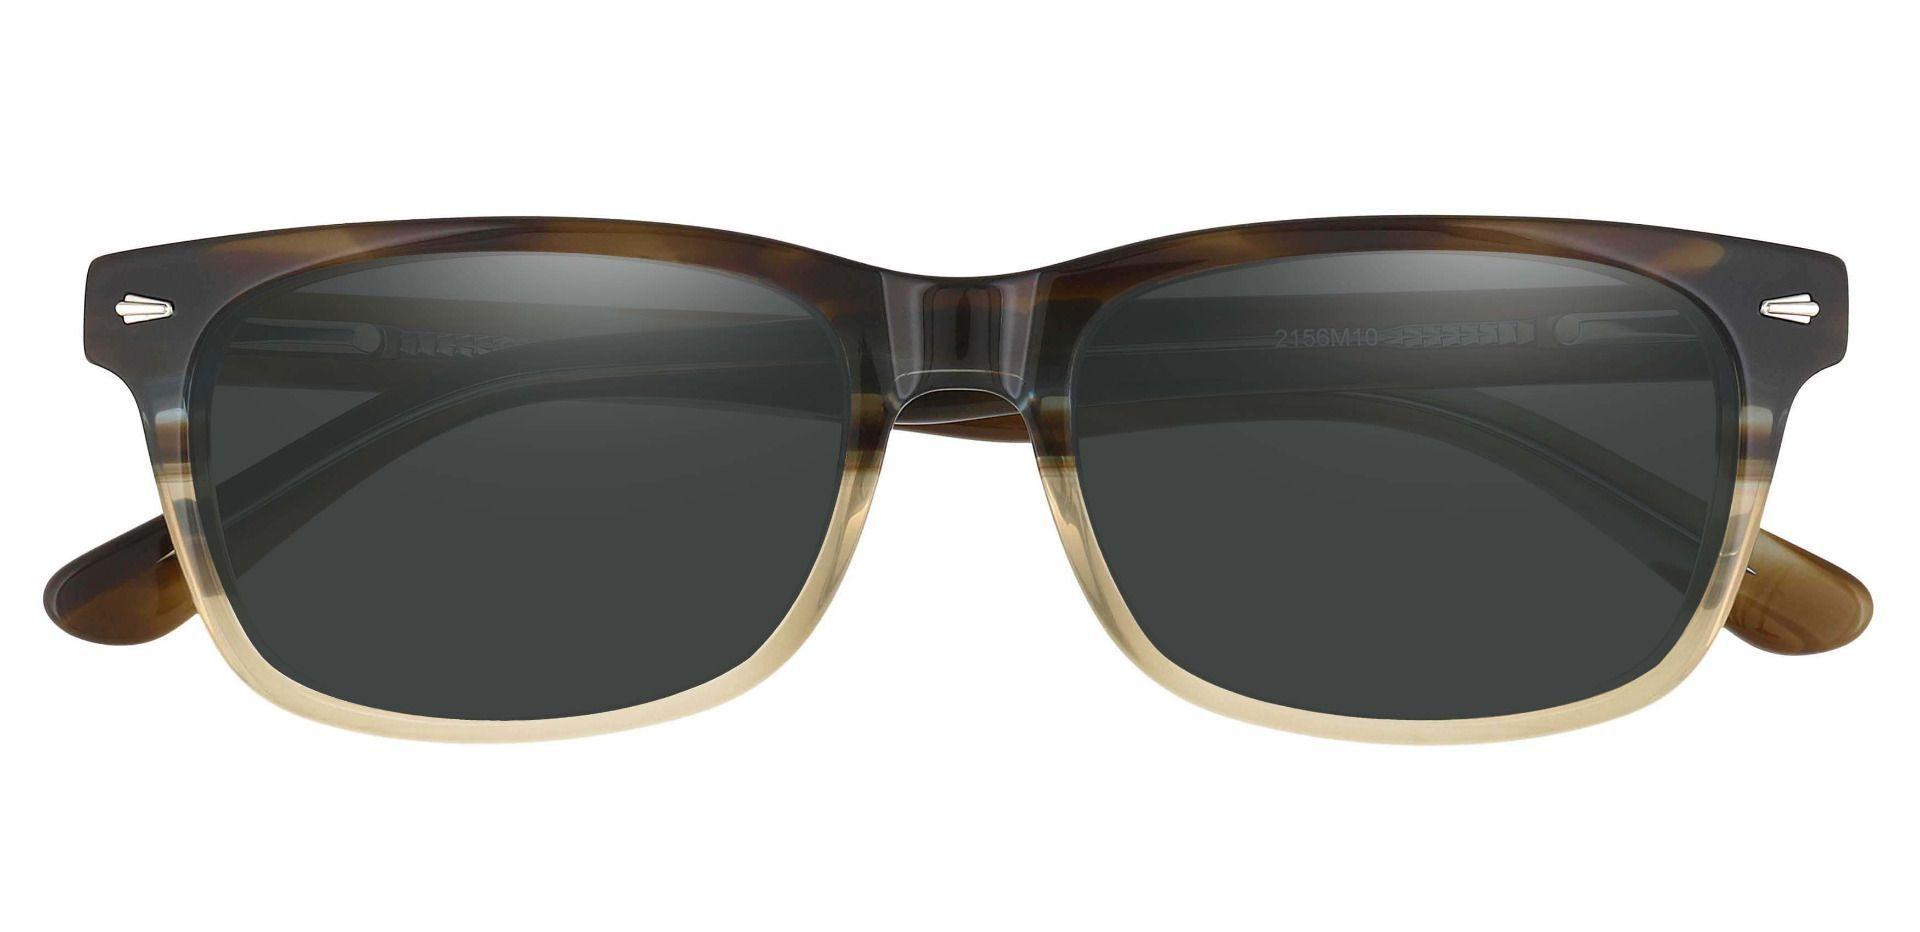 Hendrix Rectangle Prescription Sunglasses - Multi Color Frame With Gray Lenses